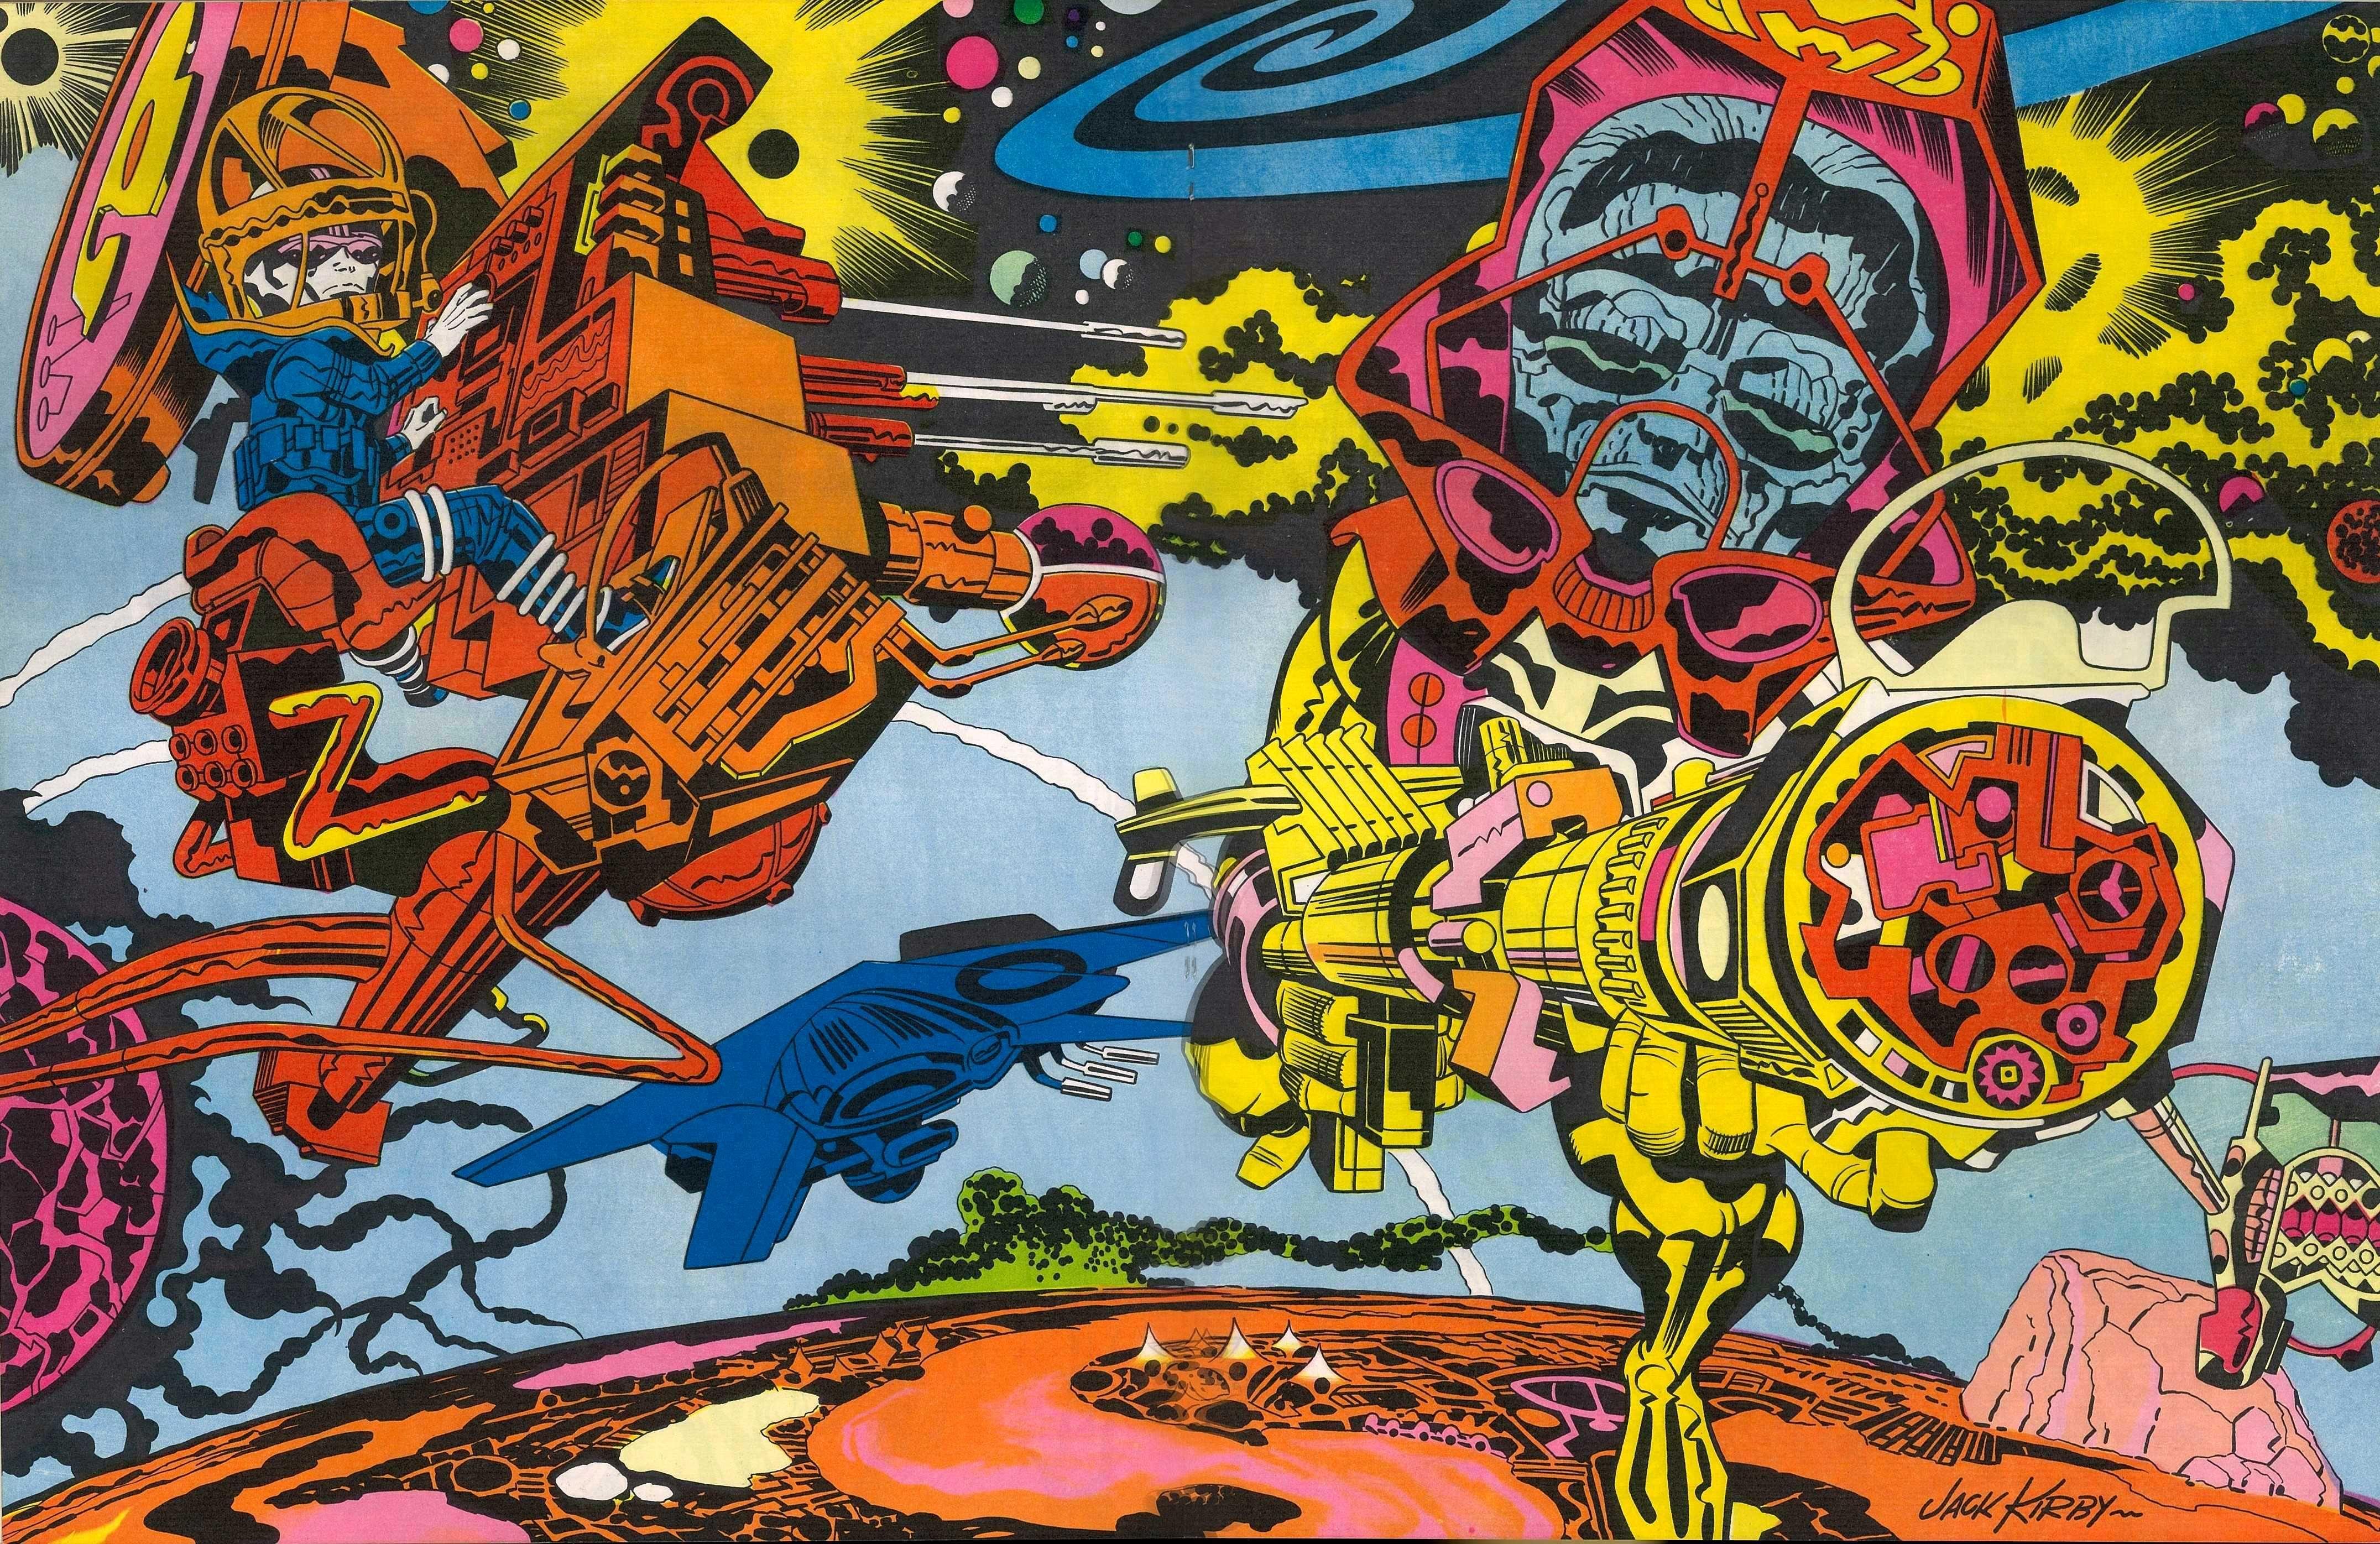 Complete Jack Kirby Portfolio from 1971! Jack kirby art